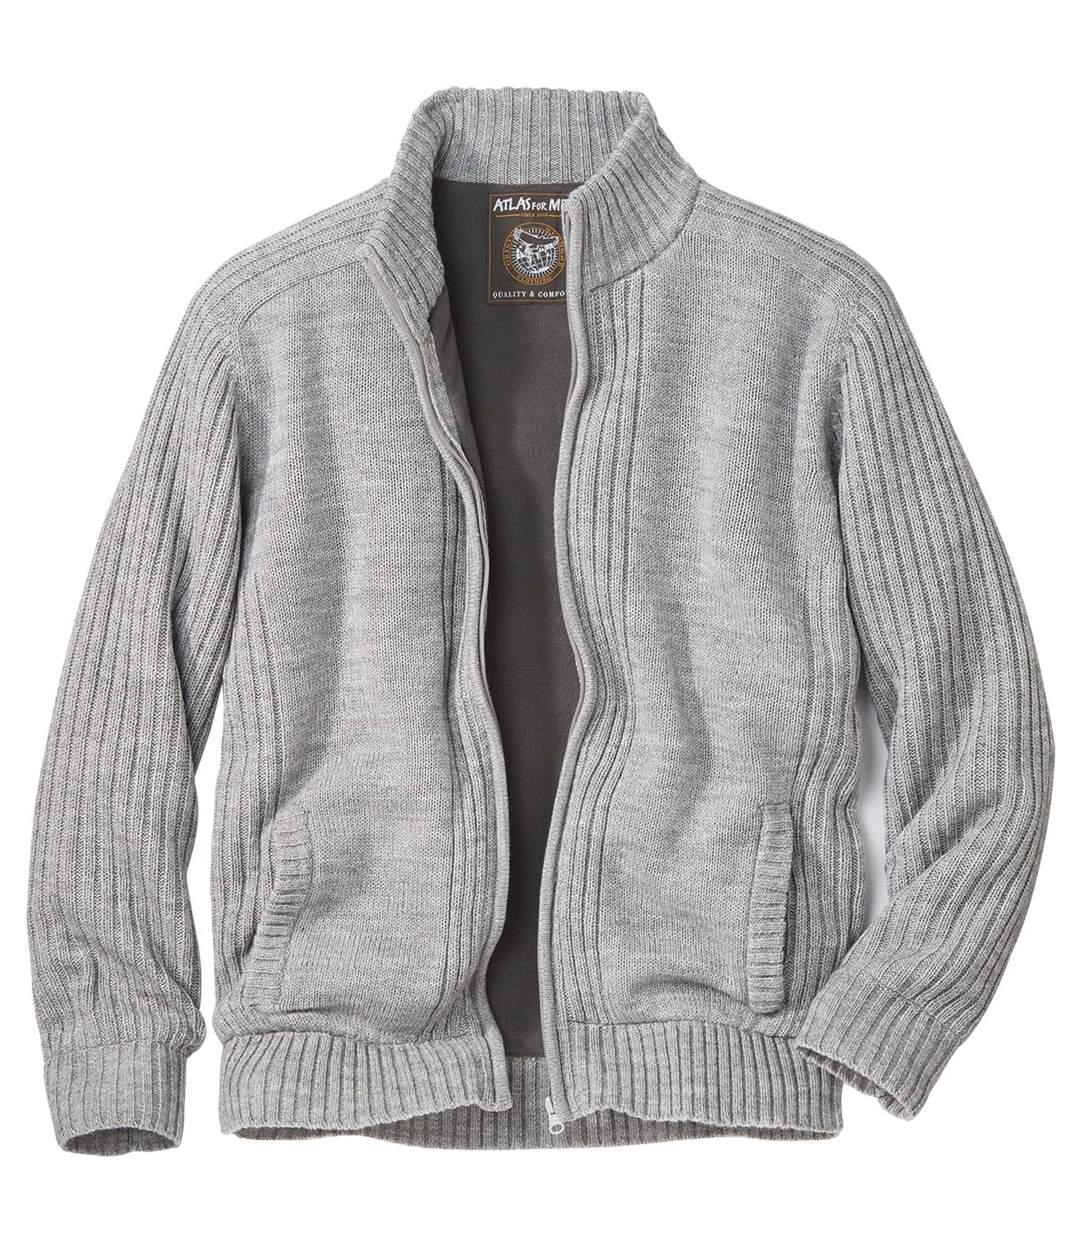 Pletený svetr s fleecovou podšívkou